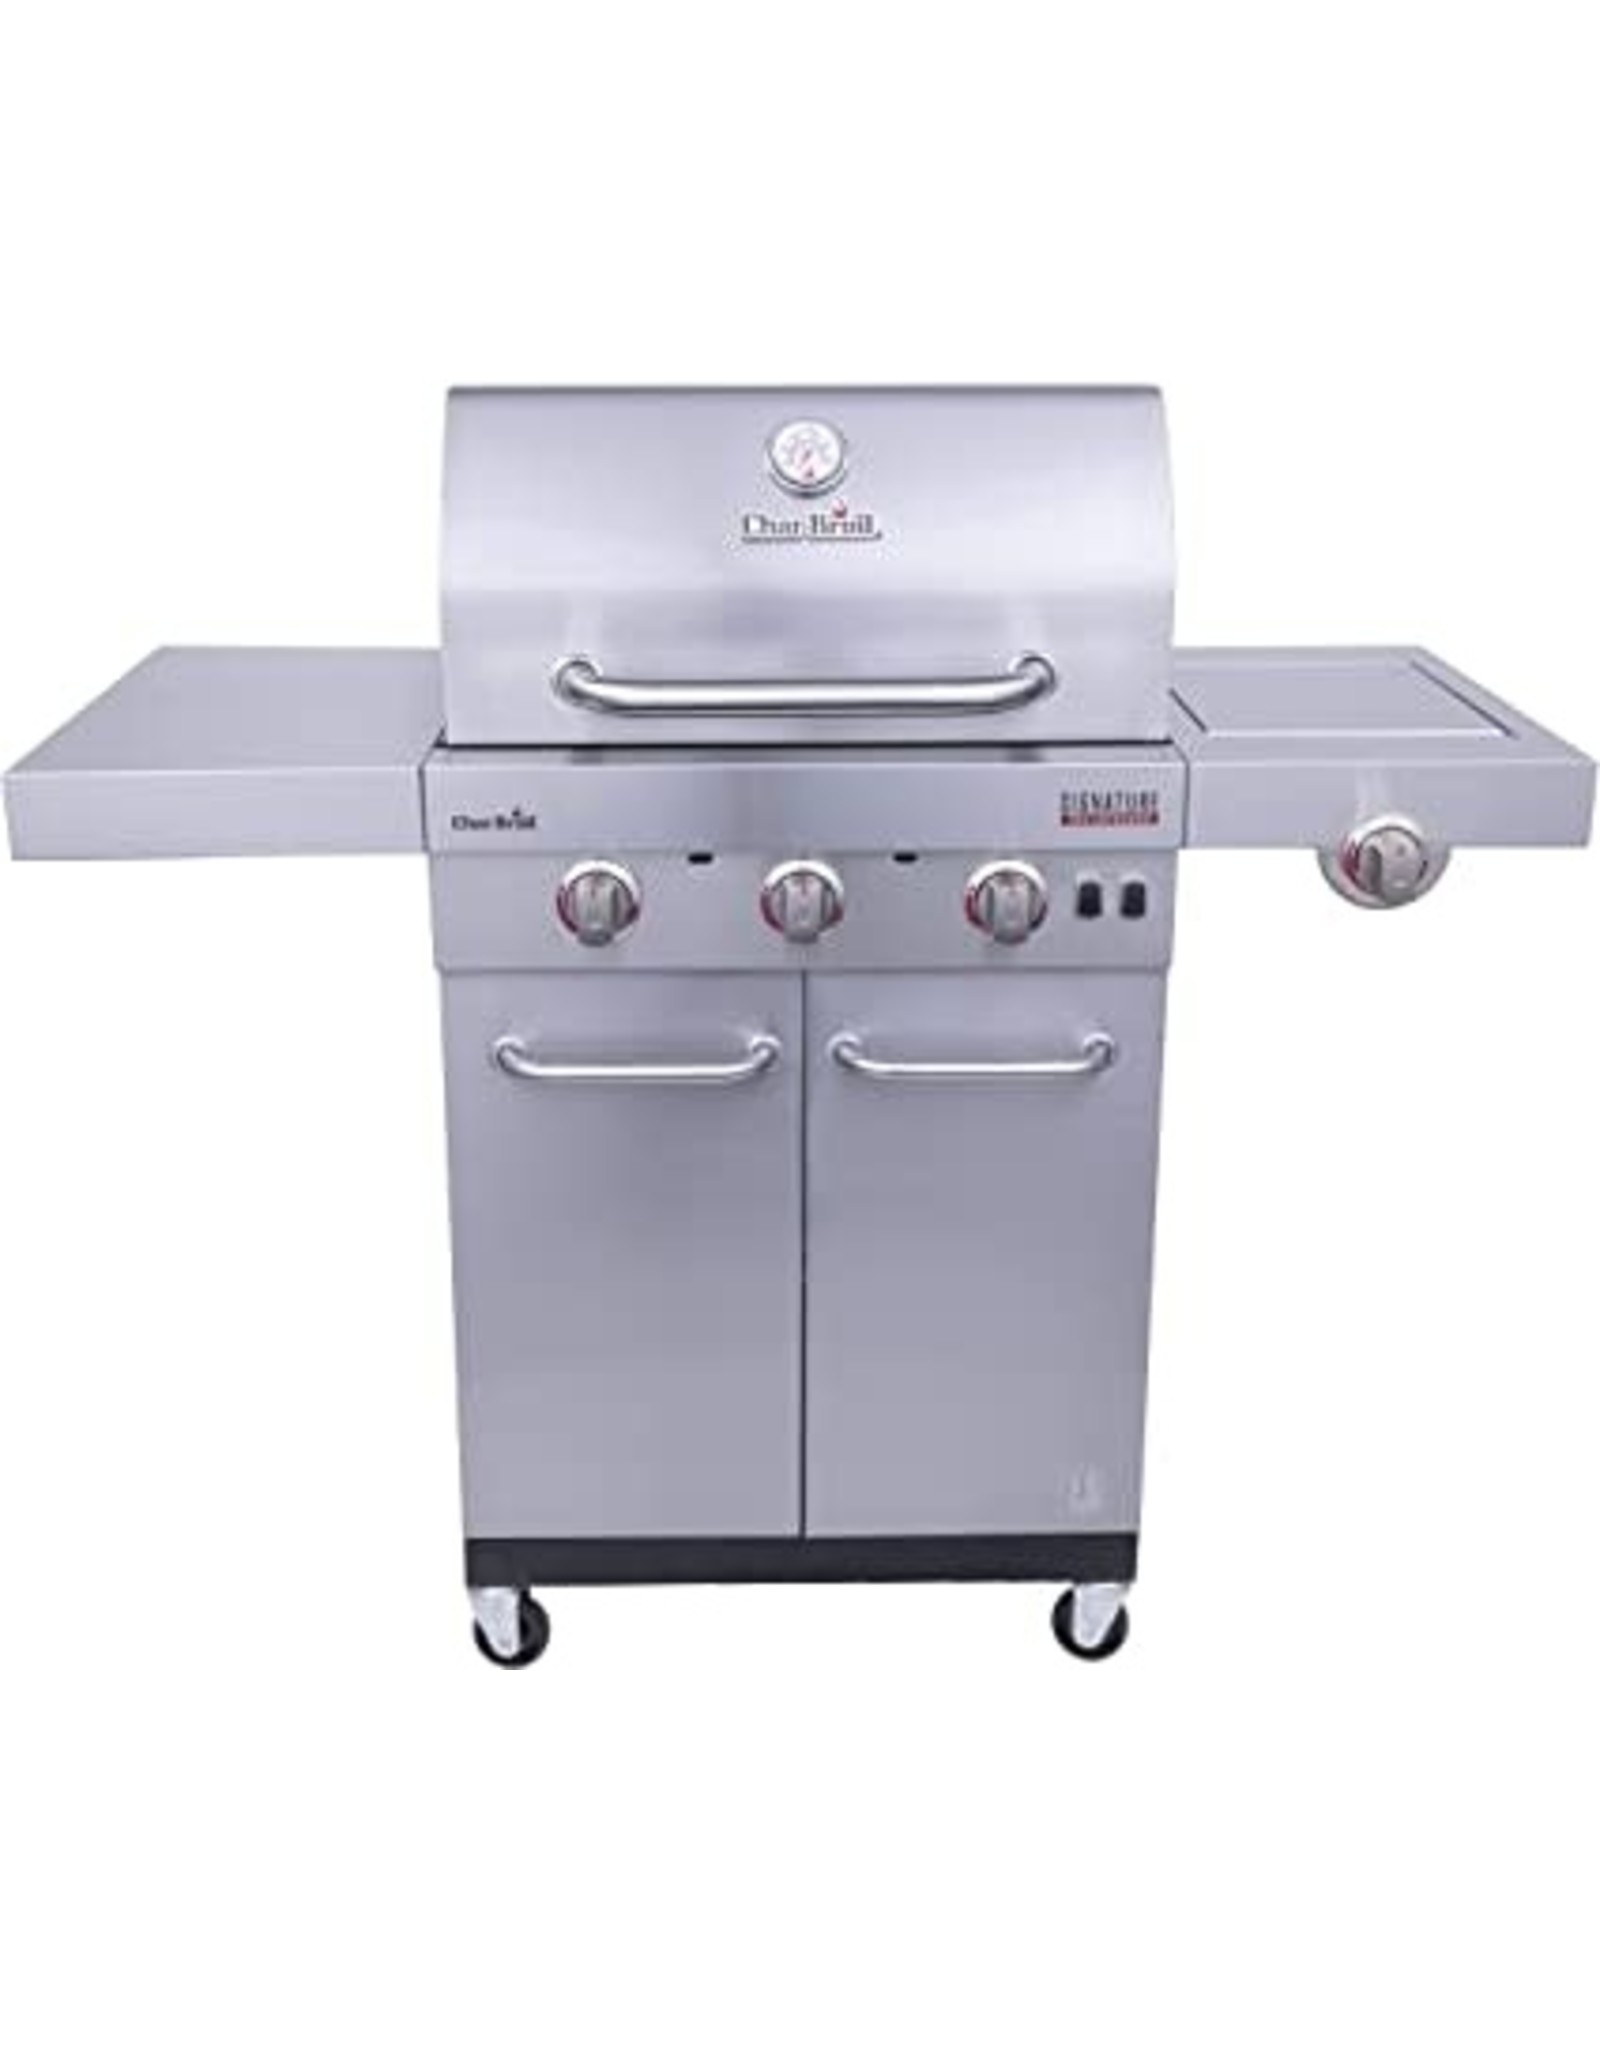 char-broil Char-Broil® Signature™ 420 TRU-Infrared™ 463342620 420 3-Burner Gas Grill